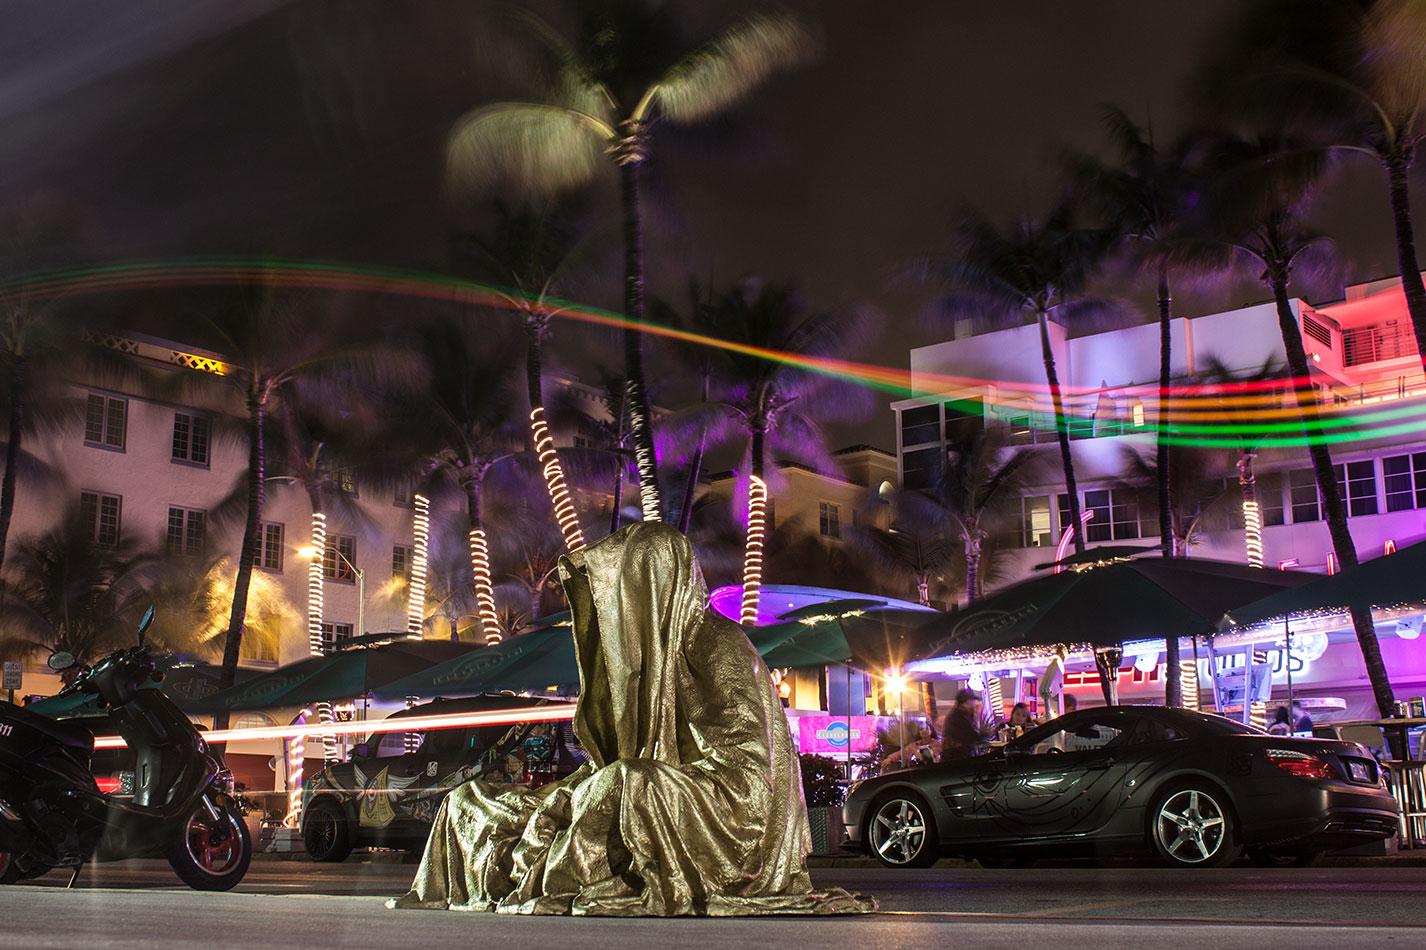 art-basel-miami-beach-fair-usa-florida-bass-museum-guardians-of-time-manfred-kili-kielnhofer-contemporary-fine-art-modern-arts-design-antiques-sculpture-6456